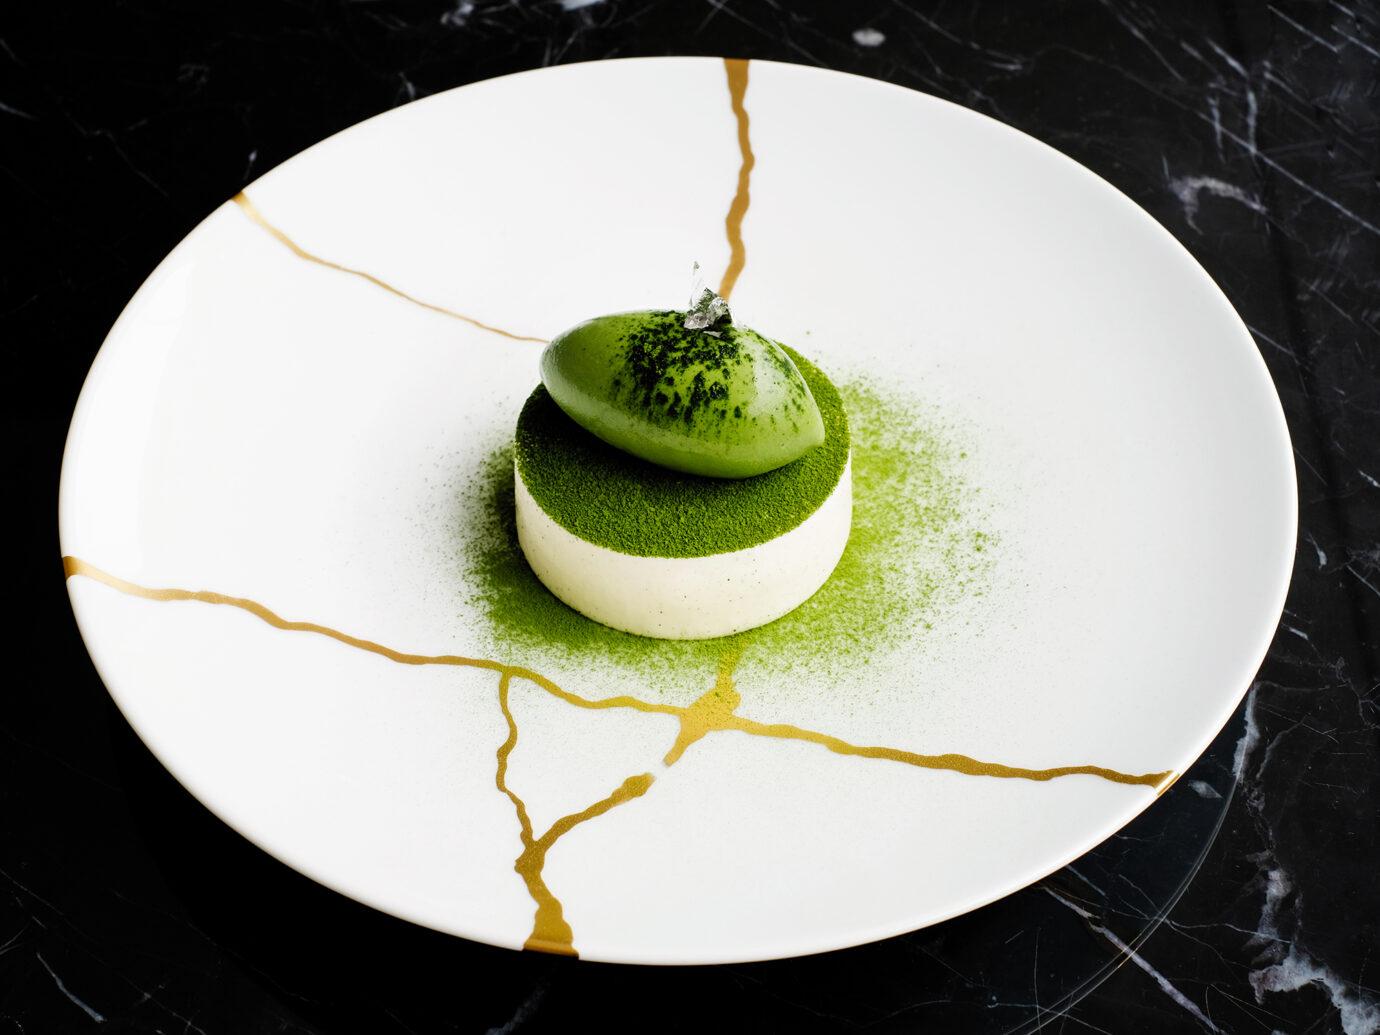 Matcha Green Tea Tiramisu with Black Sesam Crunch Inside